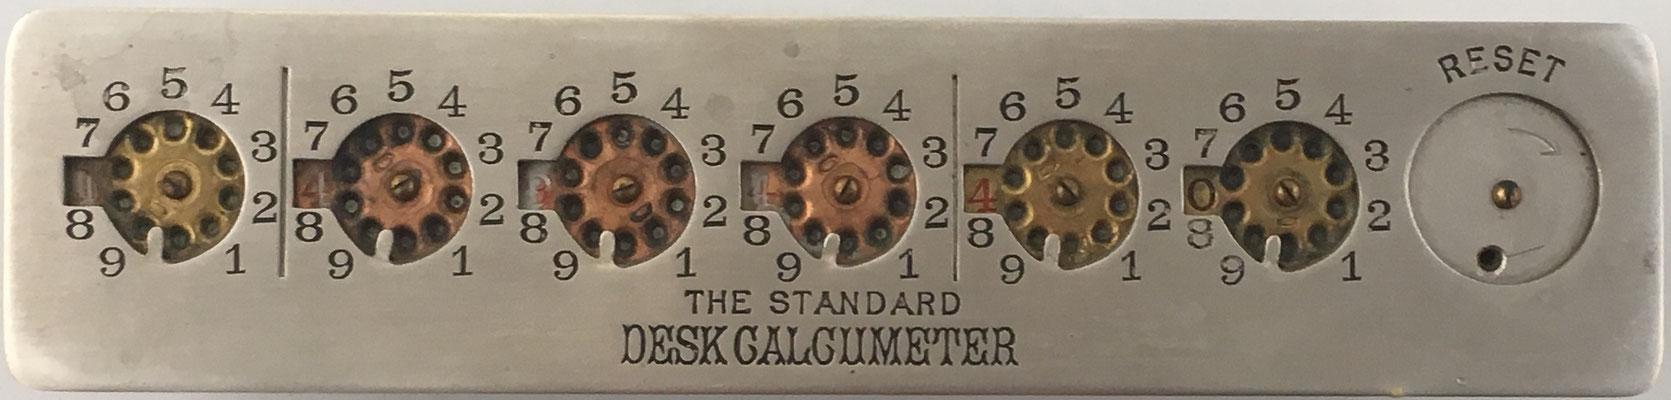 The Standard DESK CALCUMETER, s/n 94/67763, año 1901, H.N.Morse, Trenton N.J., 22x5X2 cm